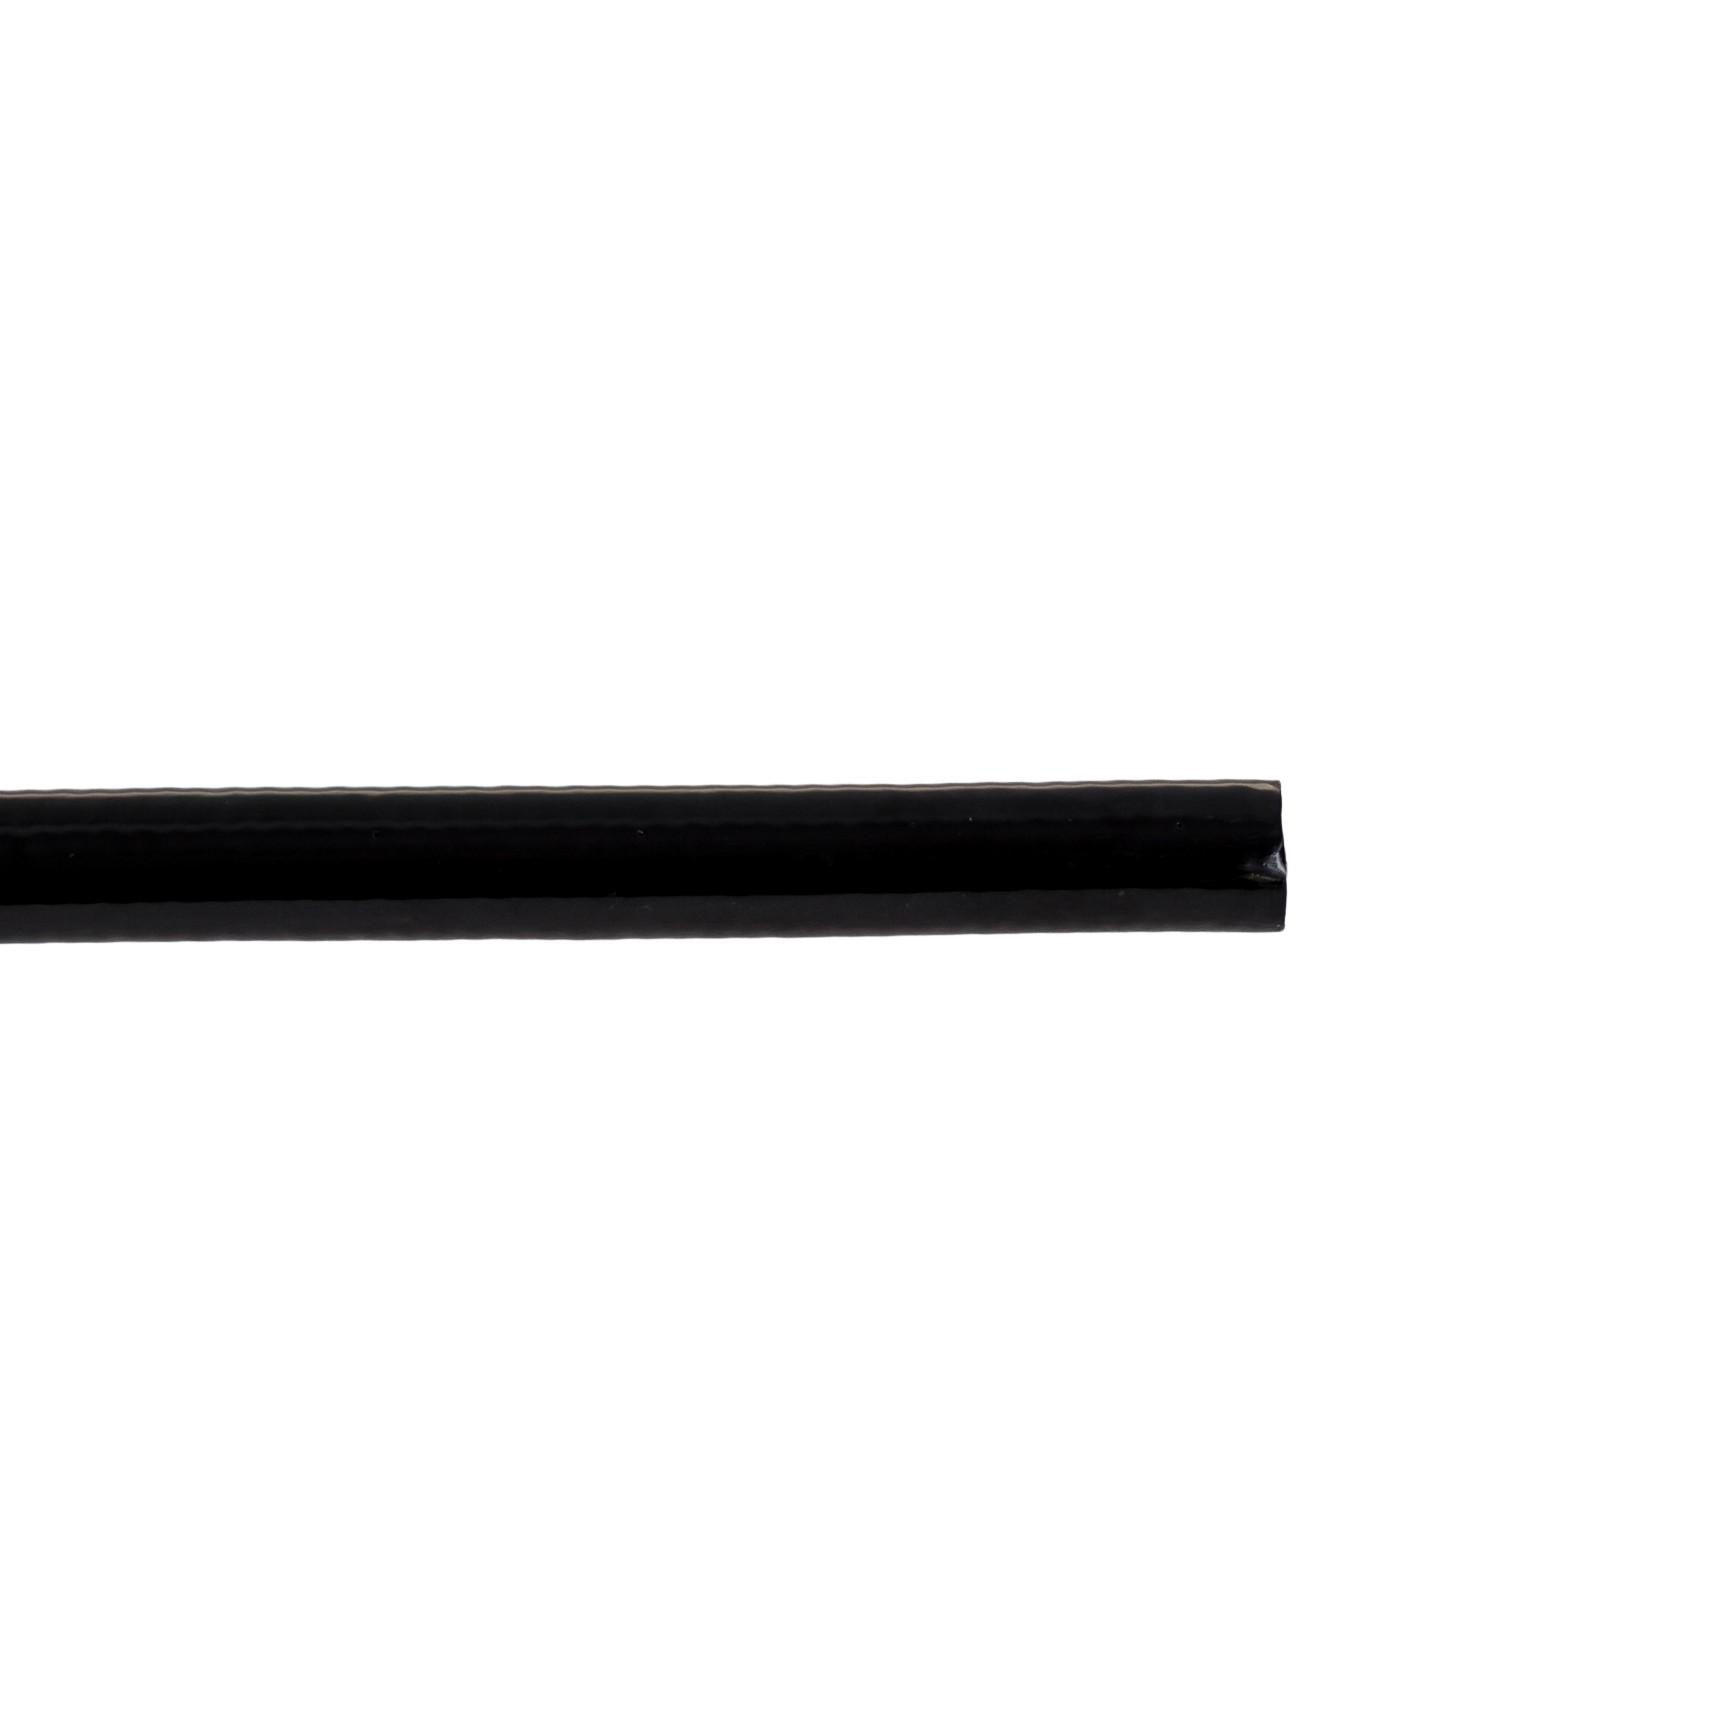 Hoses - termoplastic pipe